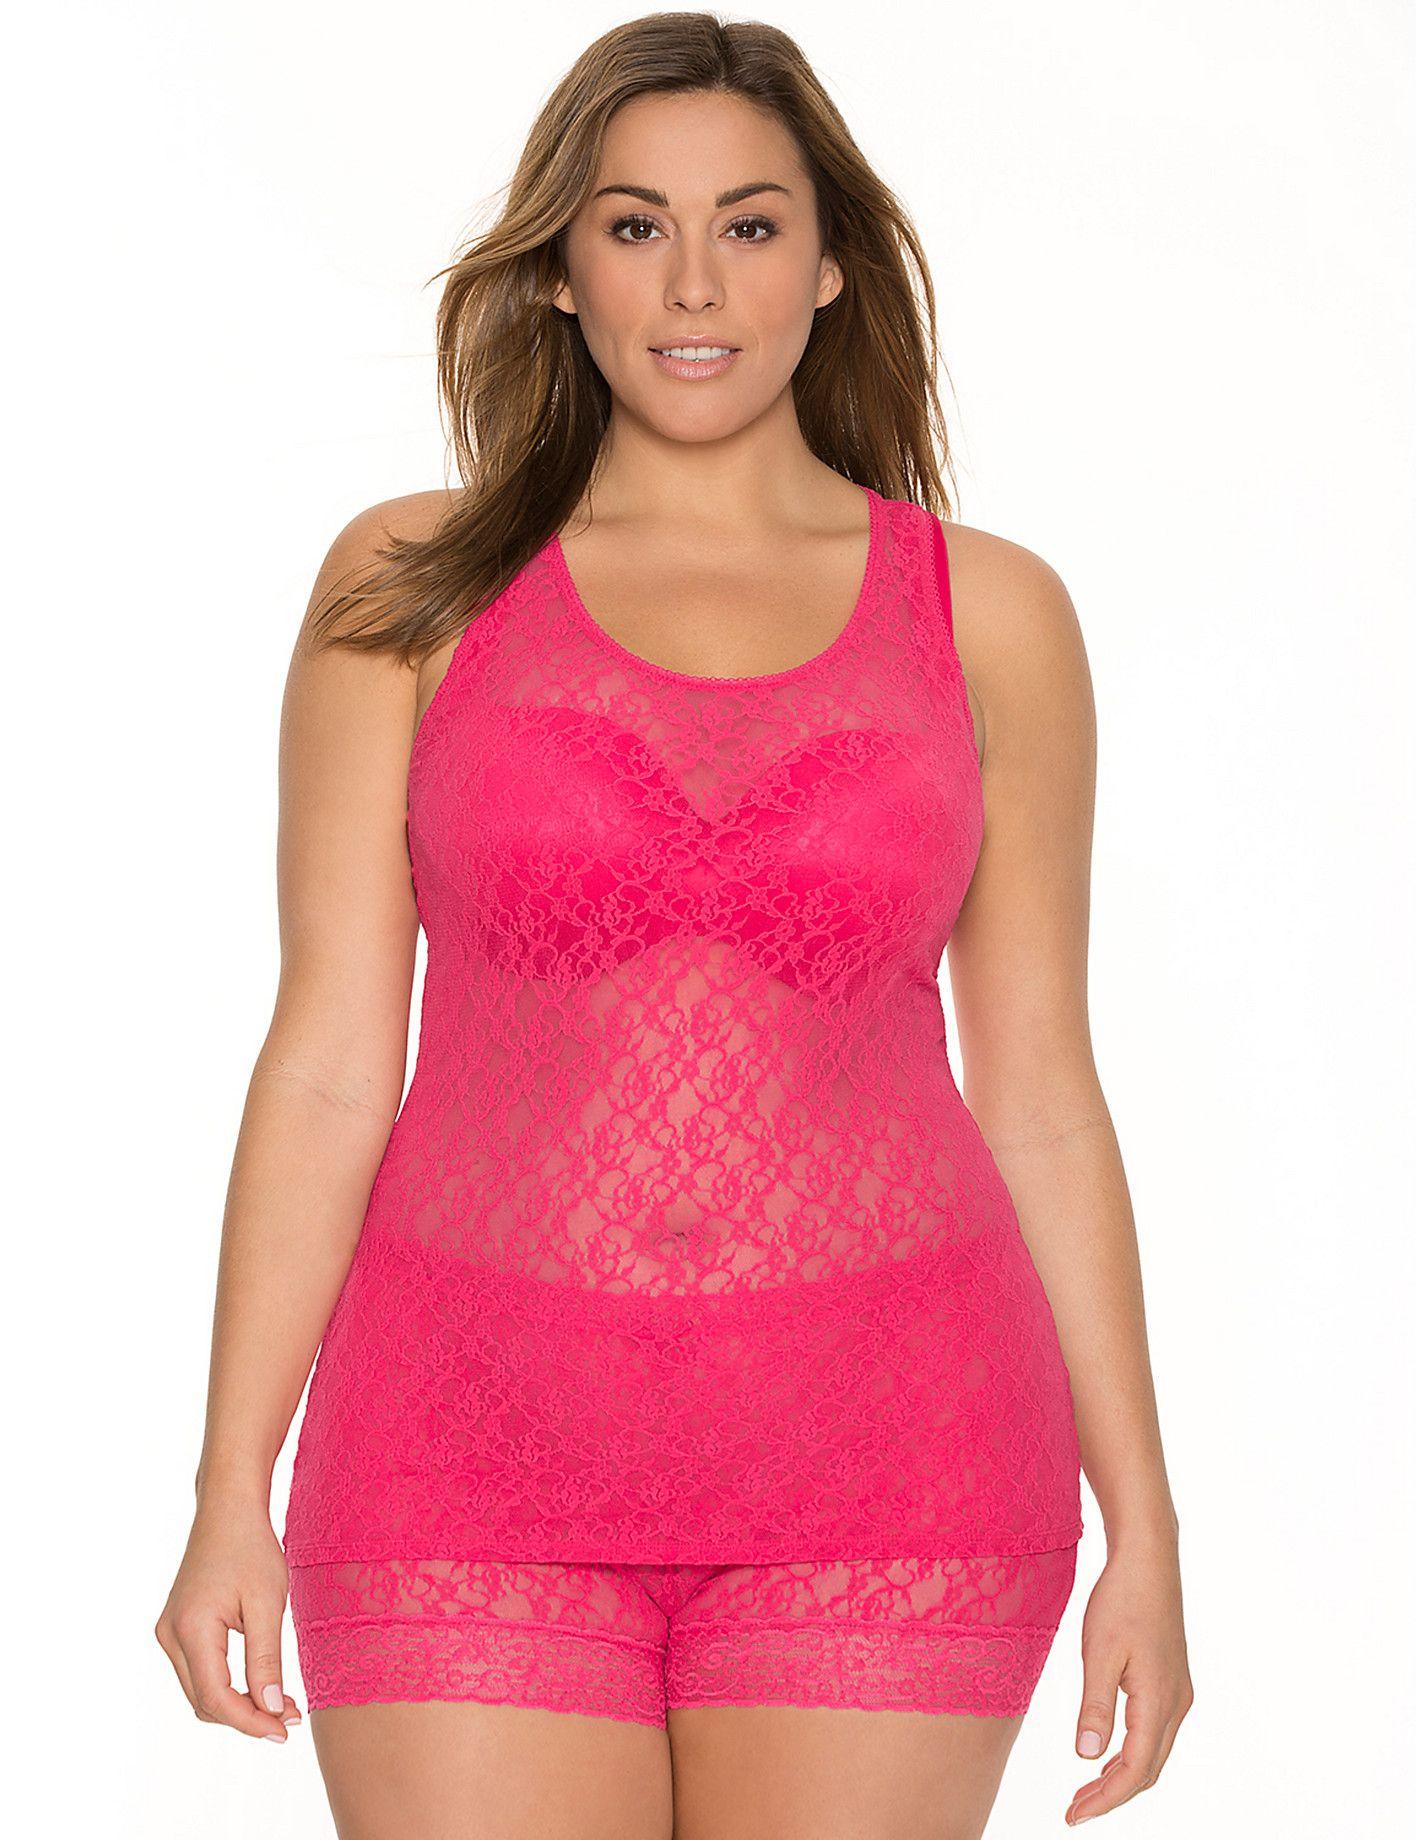 wife in lane bryant lingerie